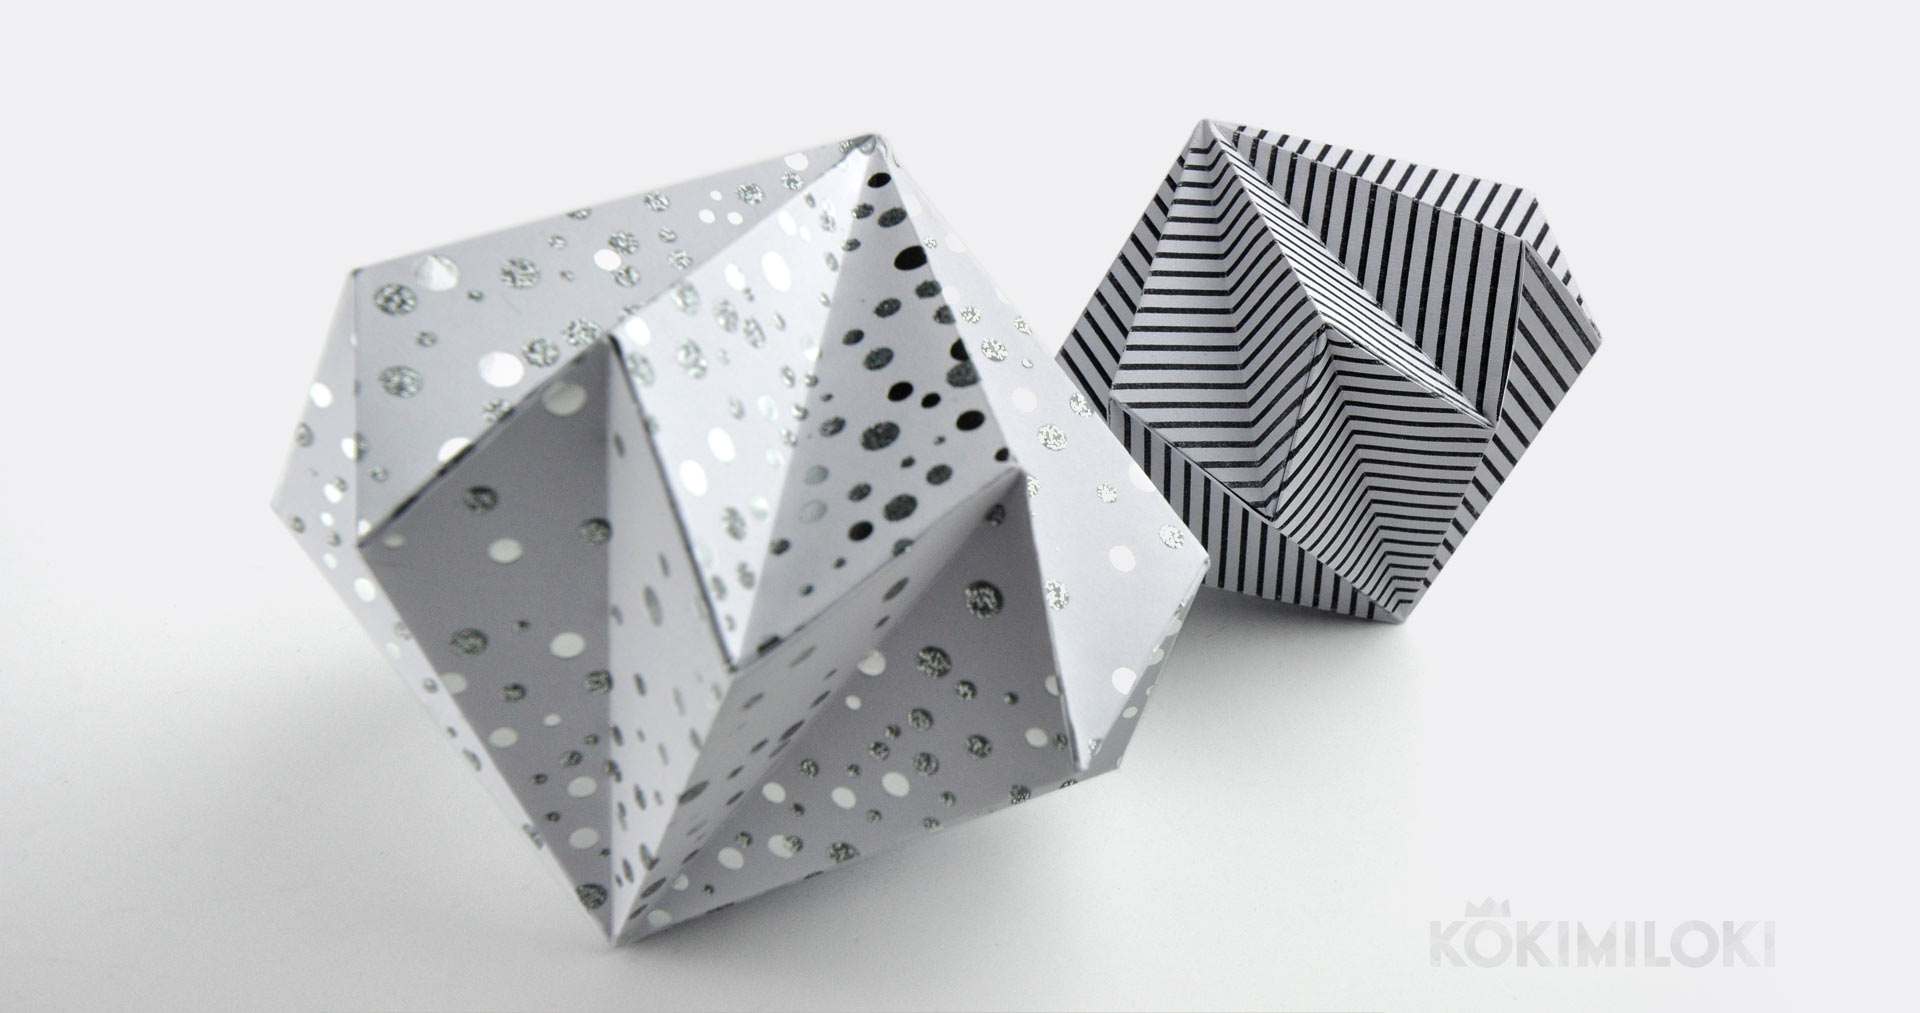 House decorating ideas - paper diamond